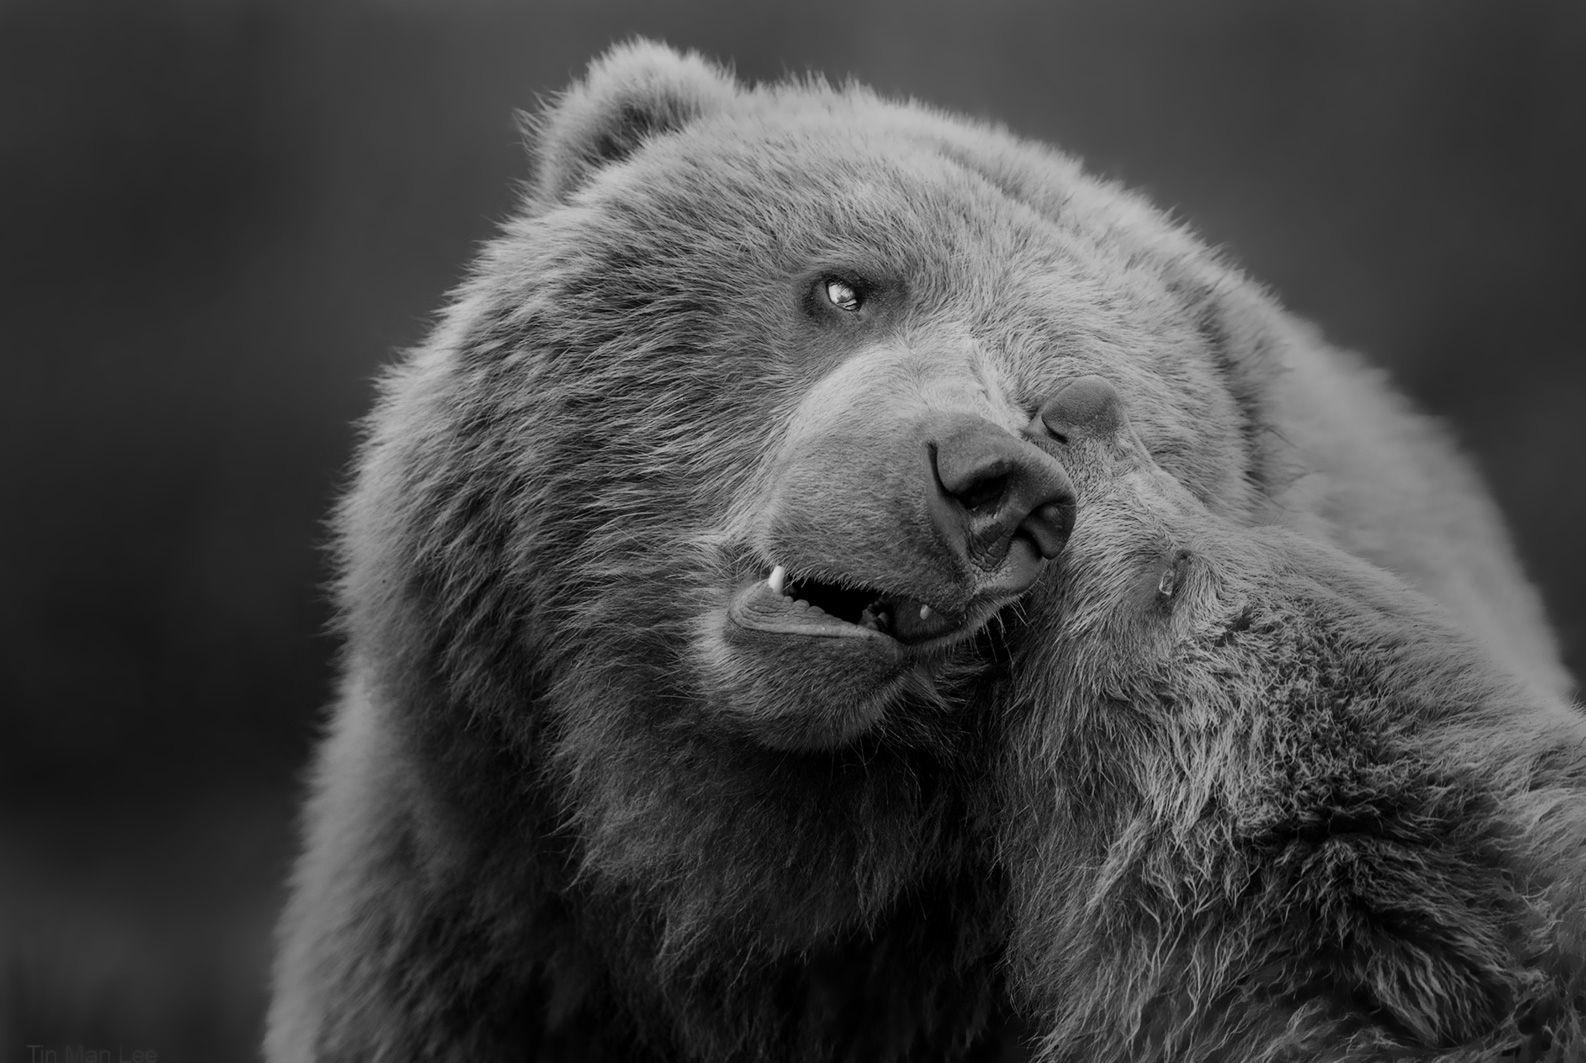 bear_mother_cub_bw.jpg